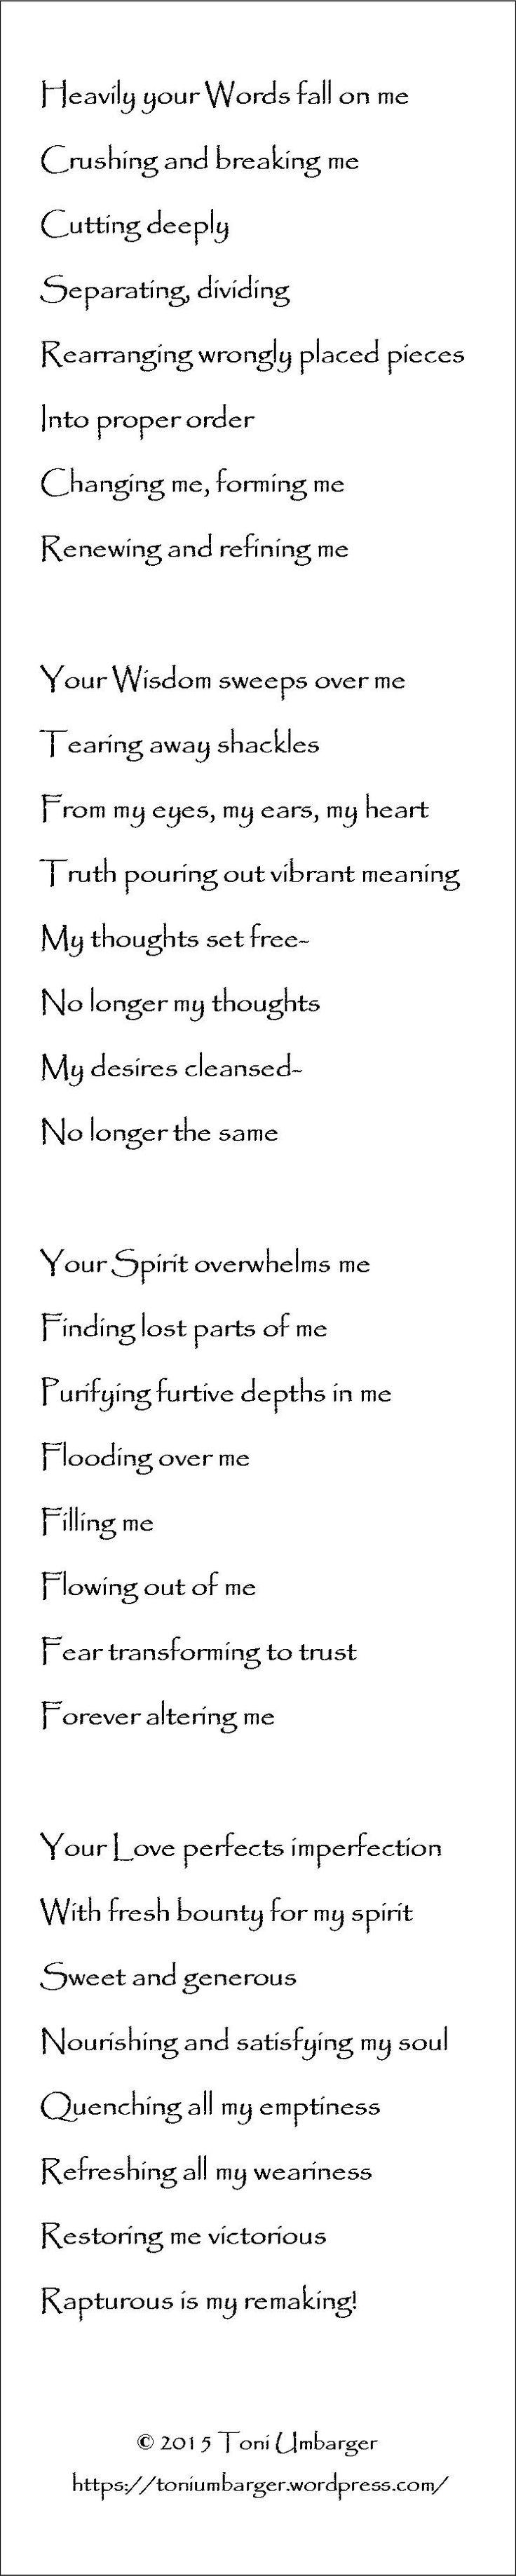 Divine Demolition #poetry #Christian faith